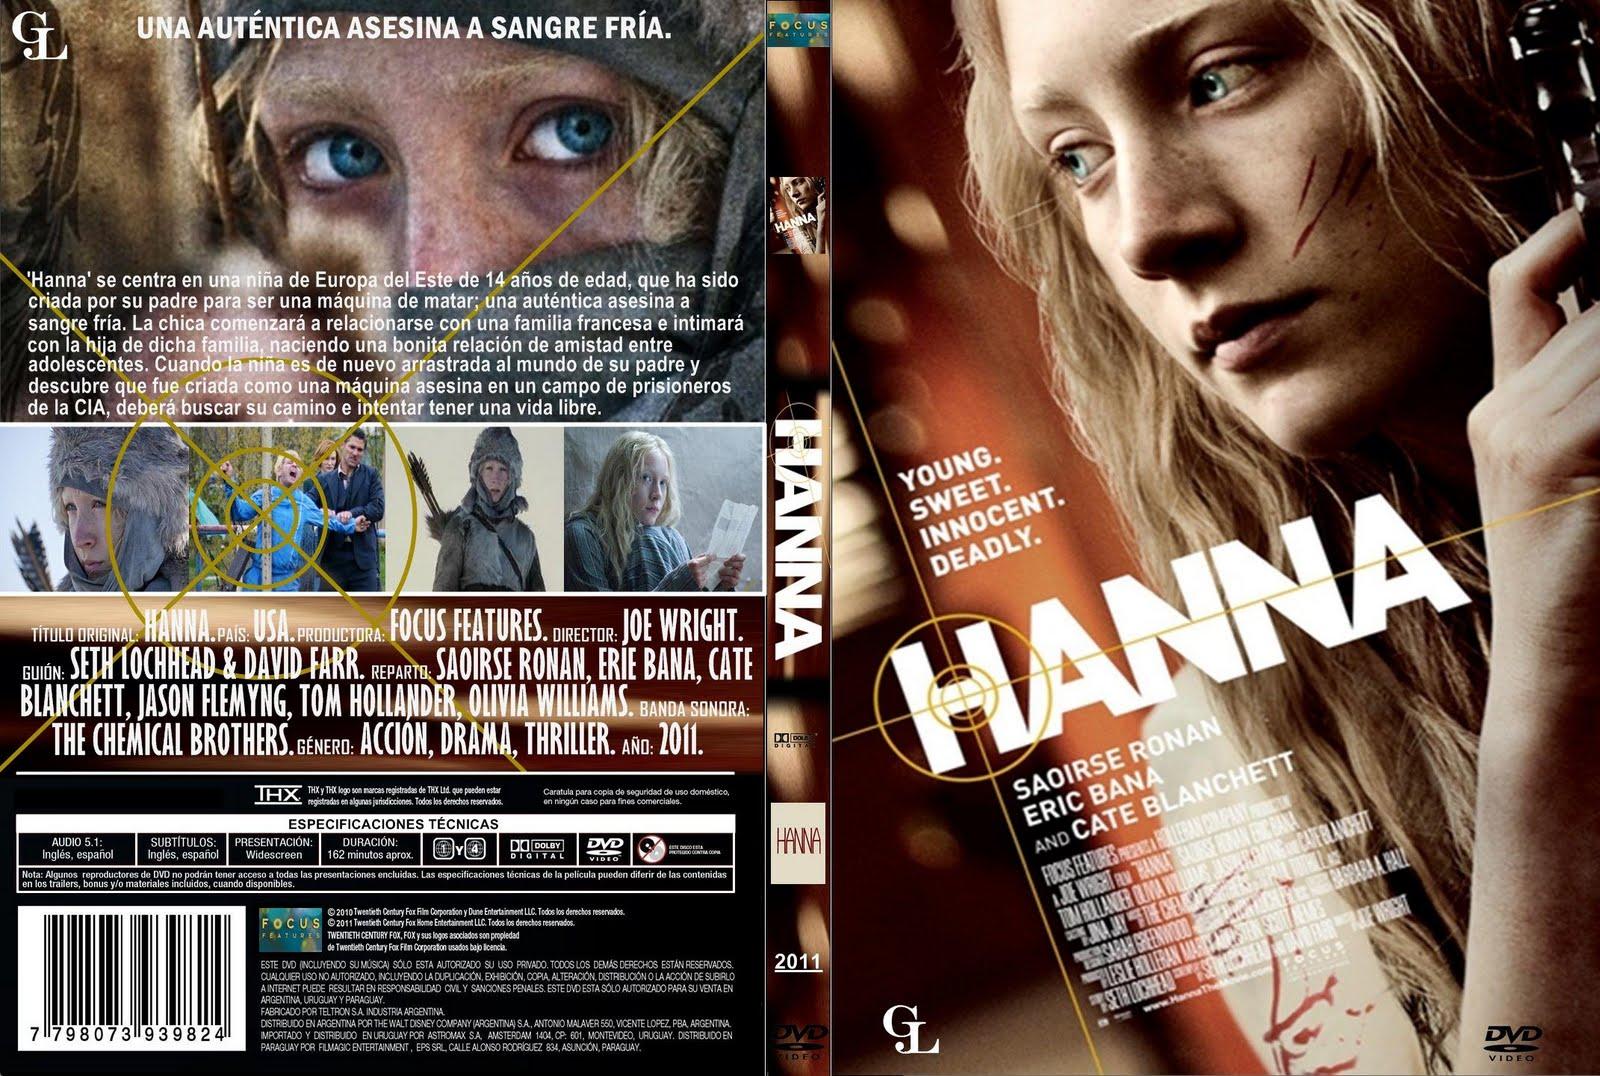 http://3.bp.blogspot.com/-5RKKPoKzwZo/TgDCTQevsSI/AAAAAAAADUo/e-39VBA_-hI/s1600/Hanna_-_Custom_por_almirantebron_%5Bdvd%5D_80.jpg